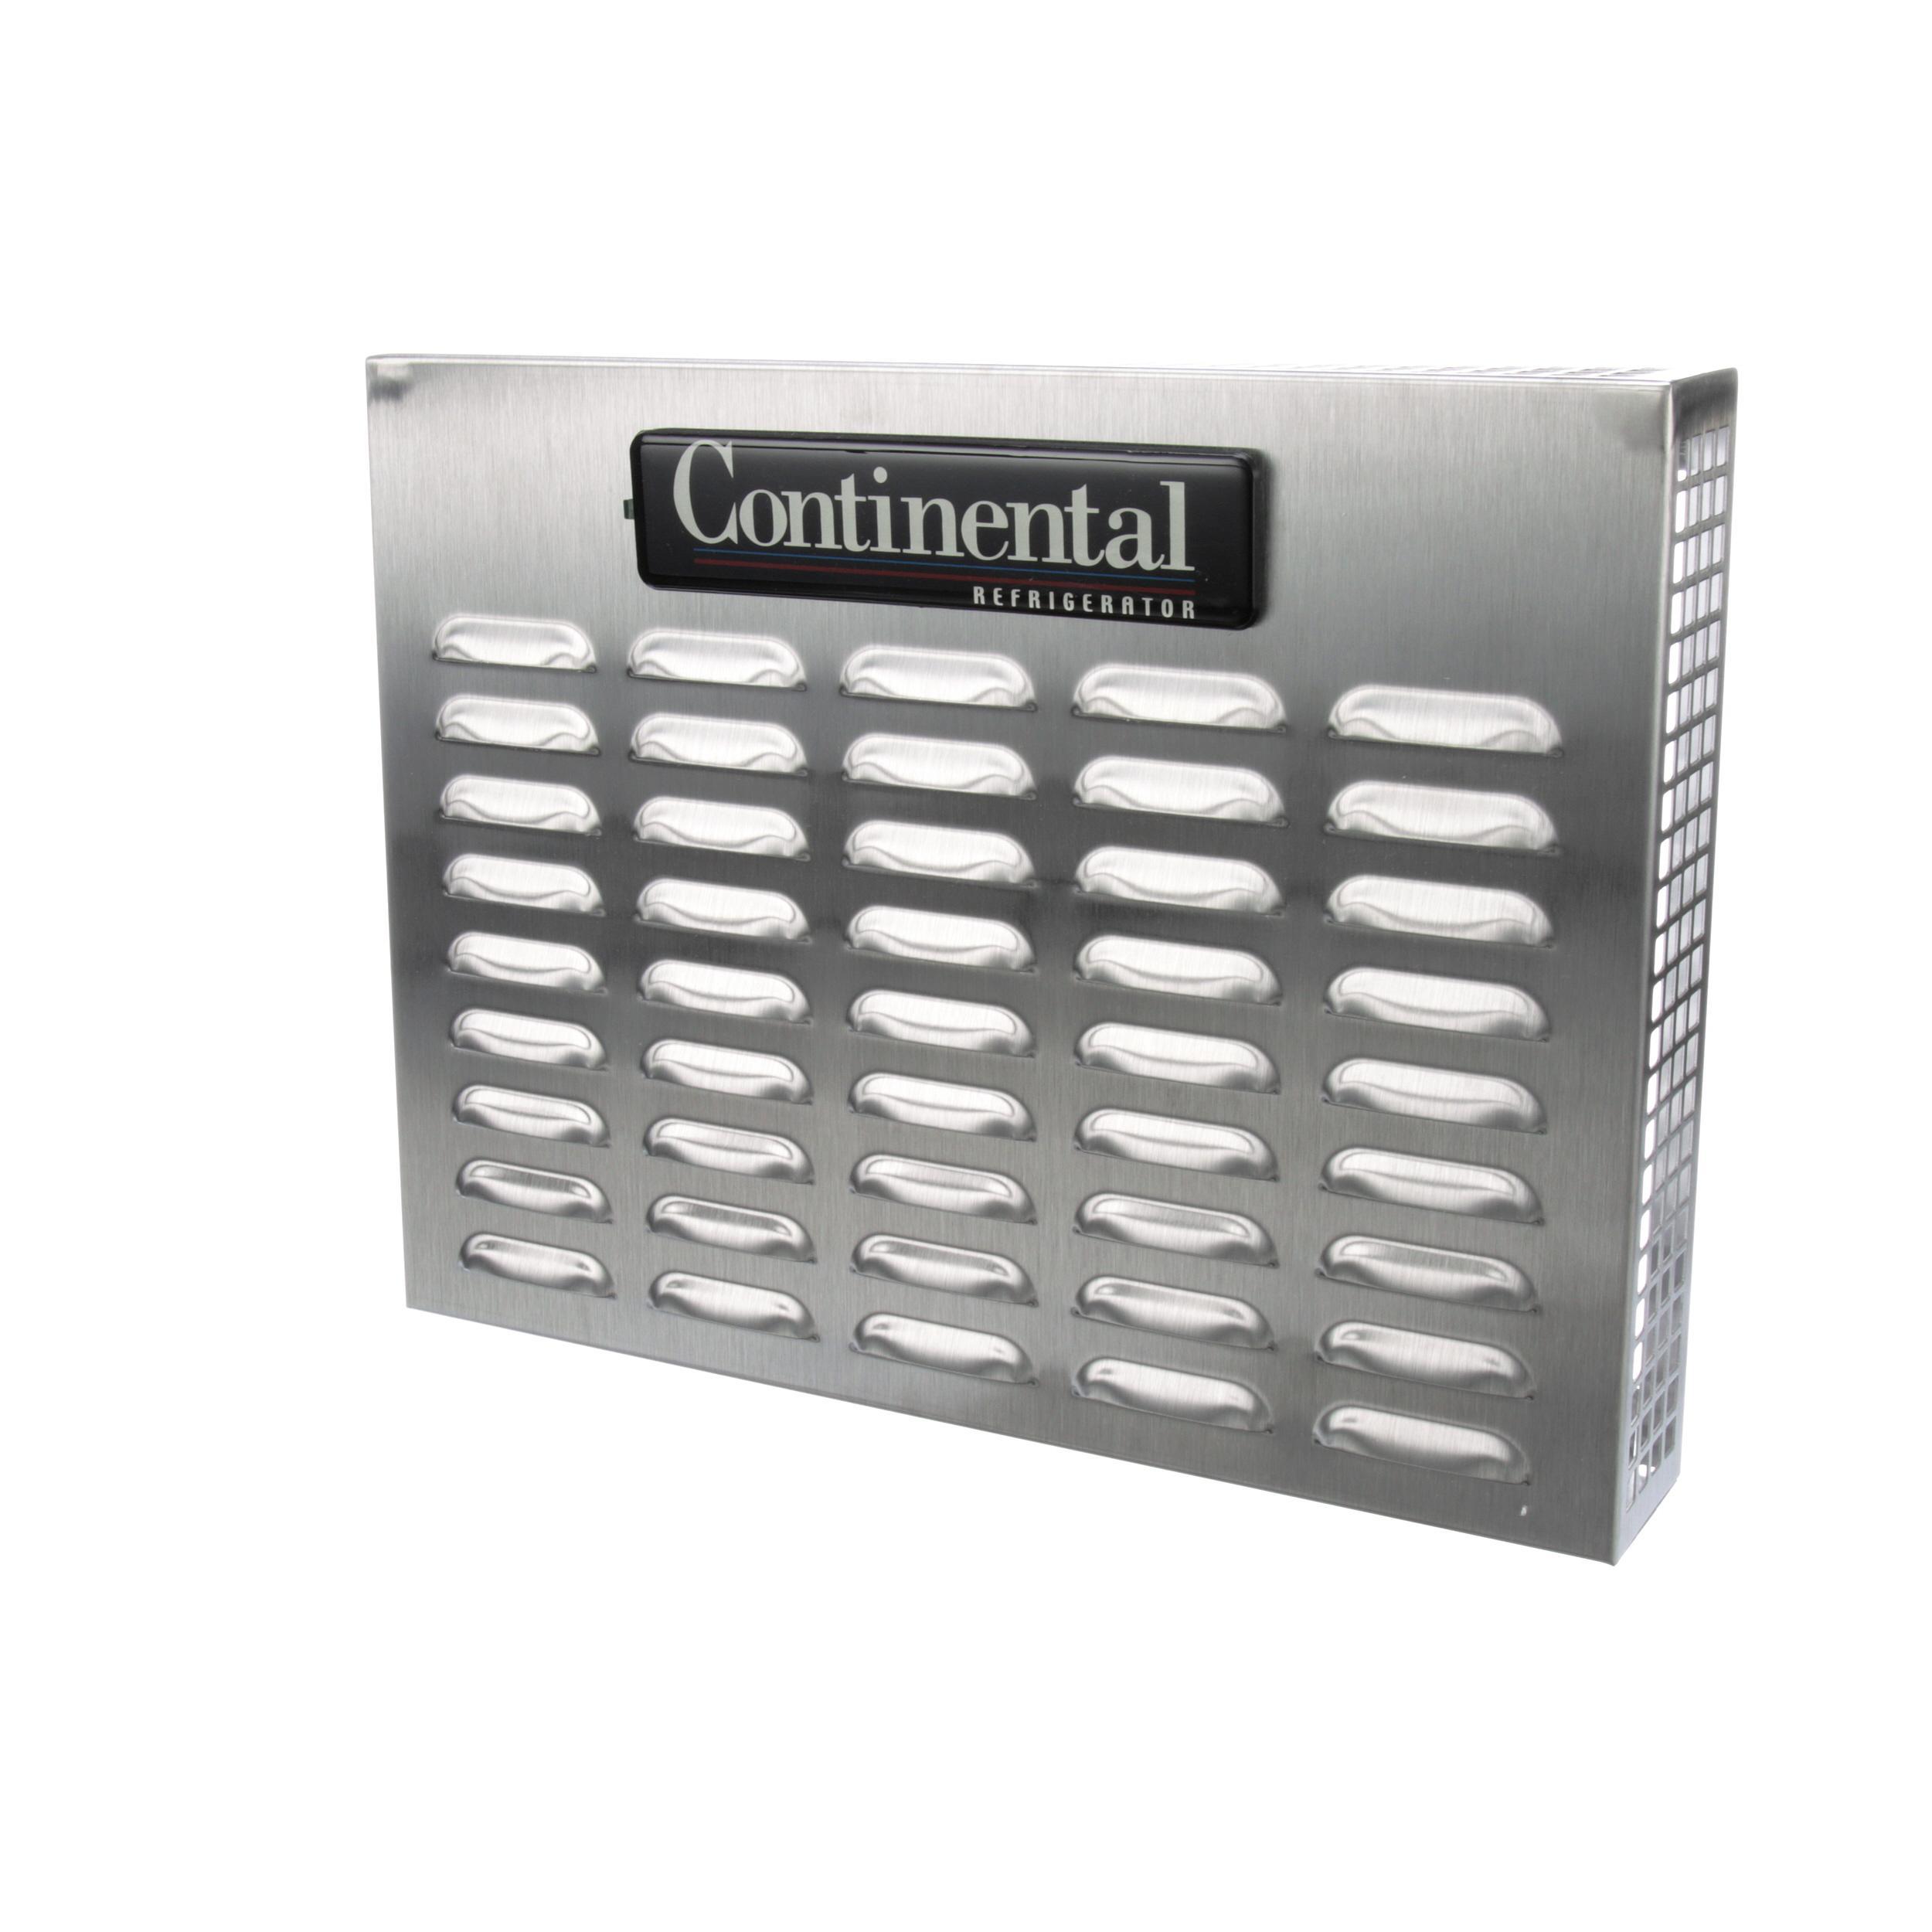 CONTINENTAL REFRIGERATOR  GRILL CPA